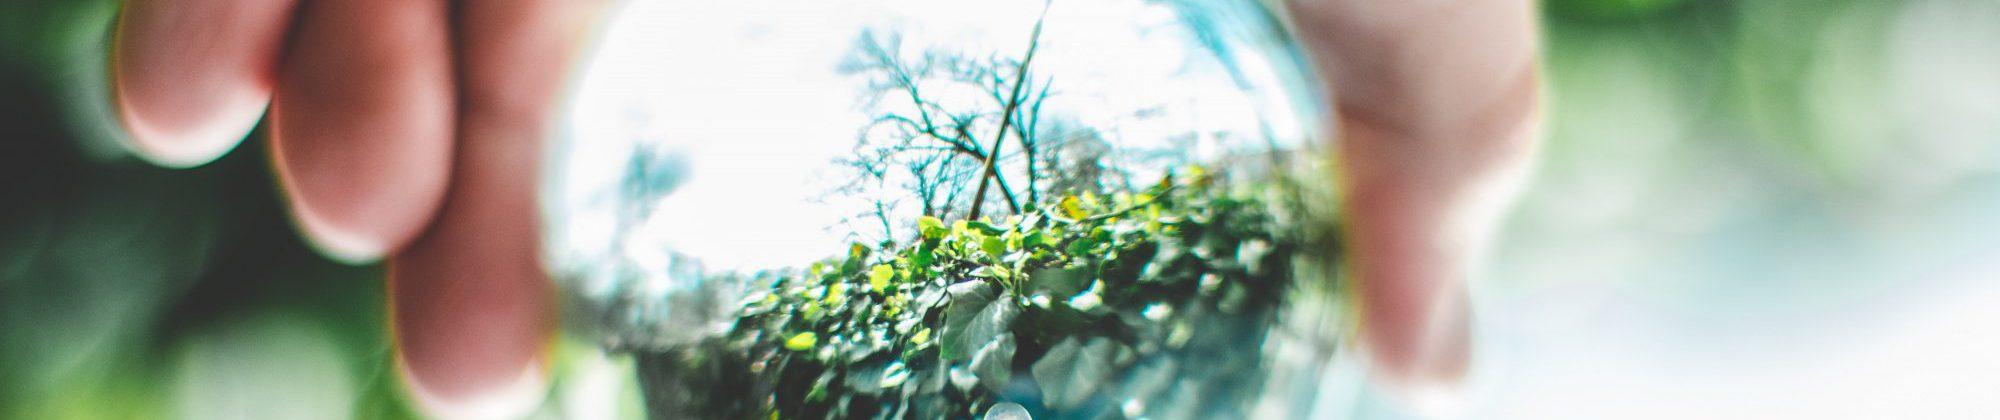 ball-shaped-blur-bokeh-2534493_2000x458_acf_cropped_2000x420_acf_cropped-1